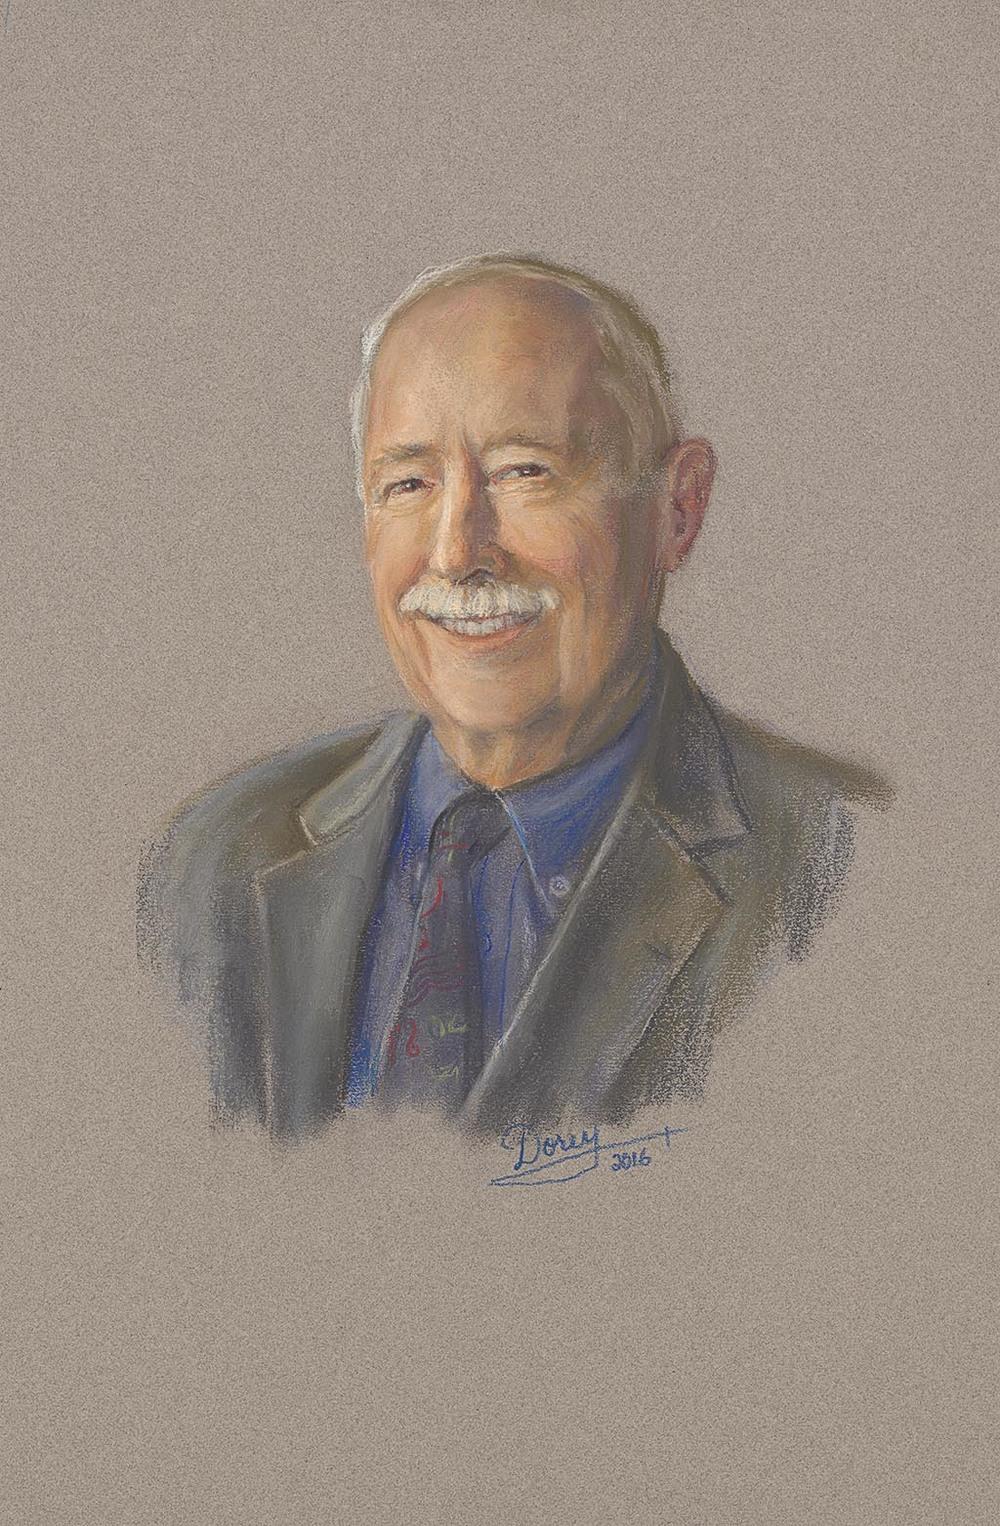 George Caines, QC